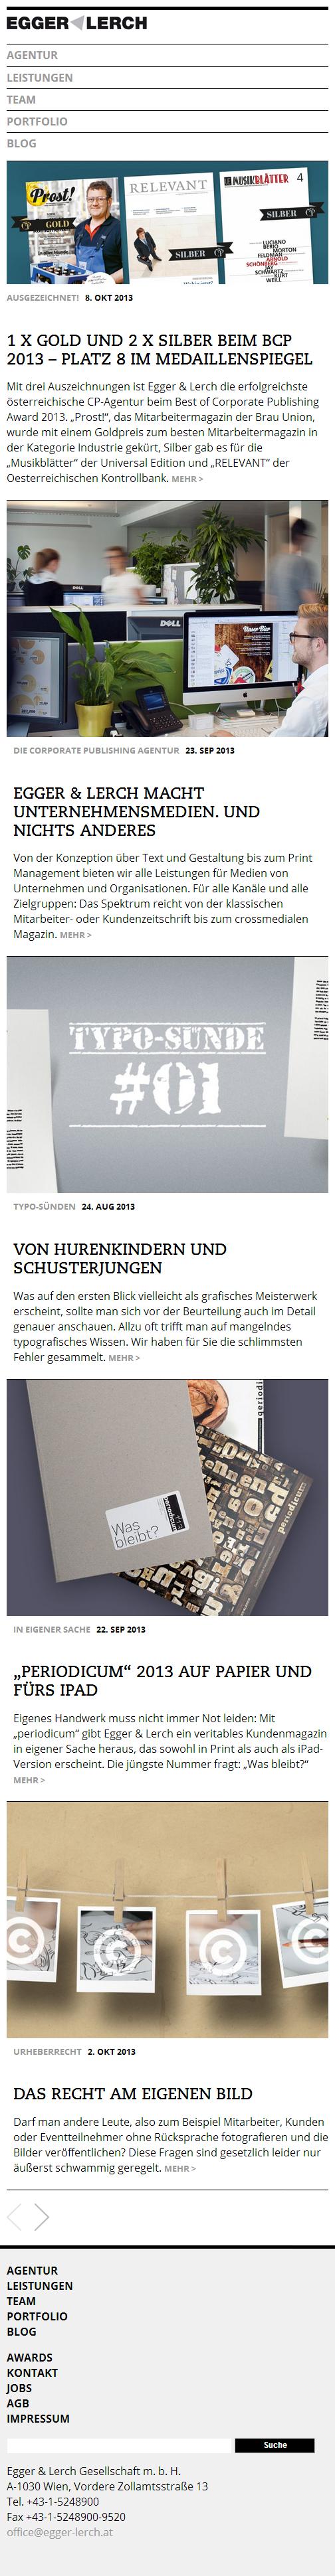 Egger & Lerch - Corporate Publishing - Mobile Website Screenshot